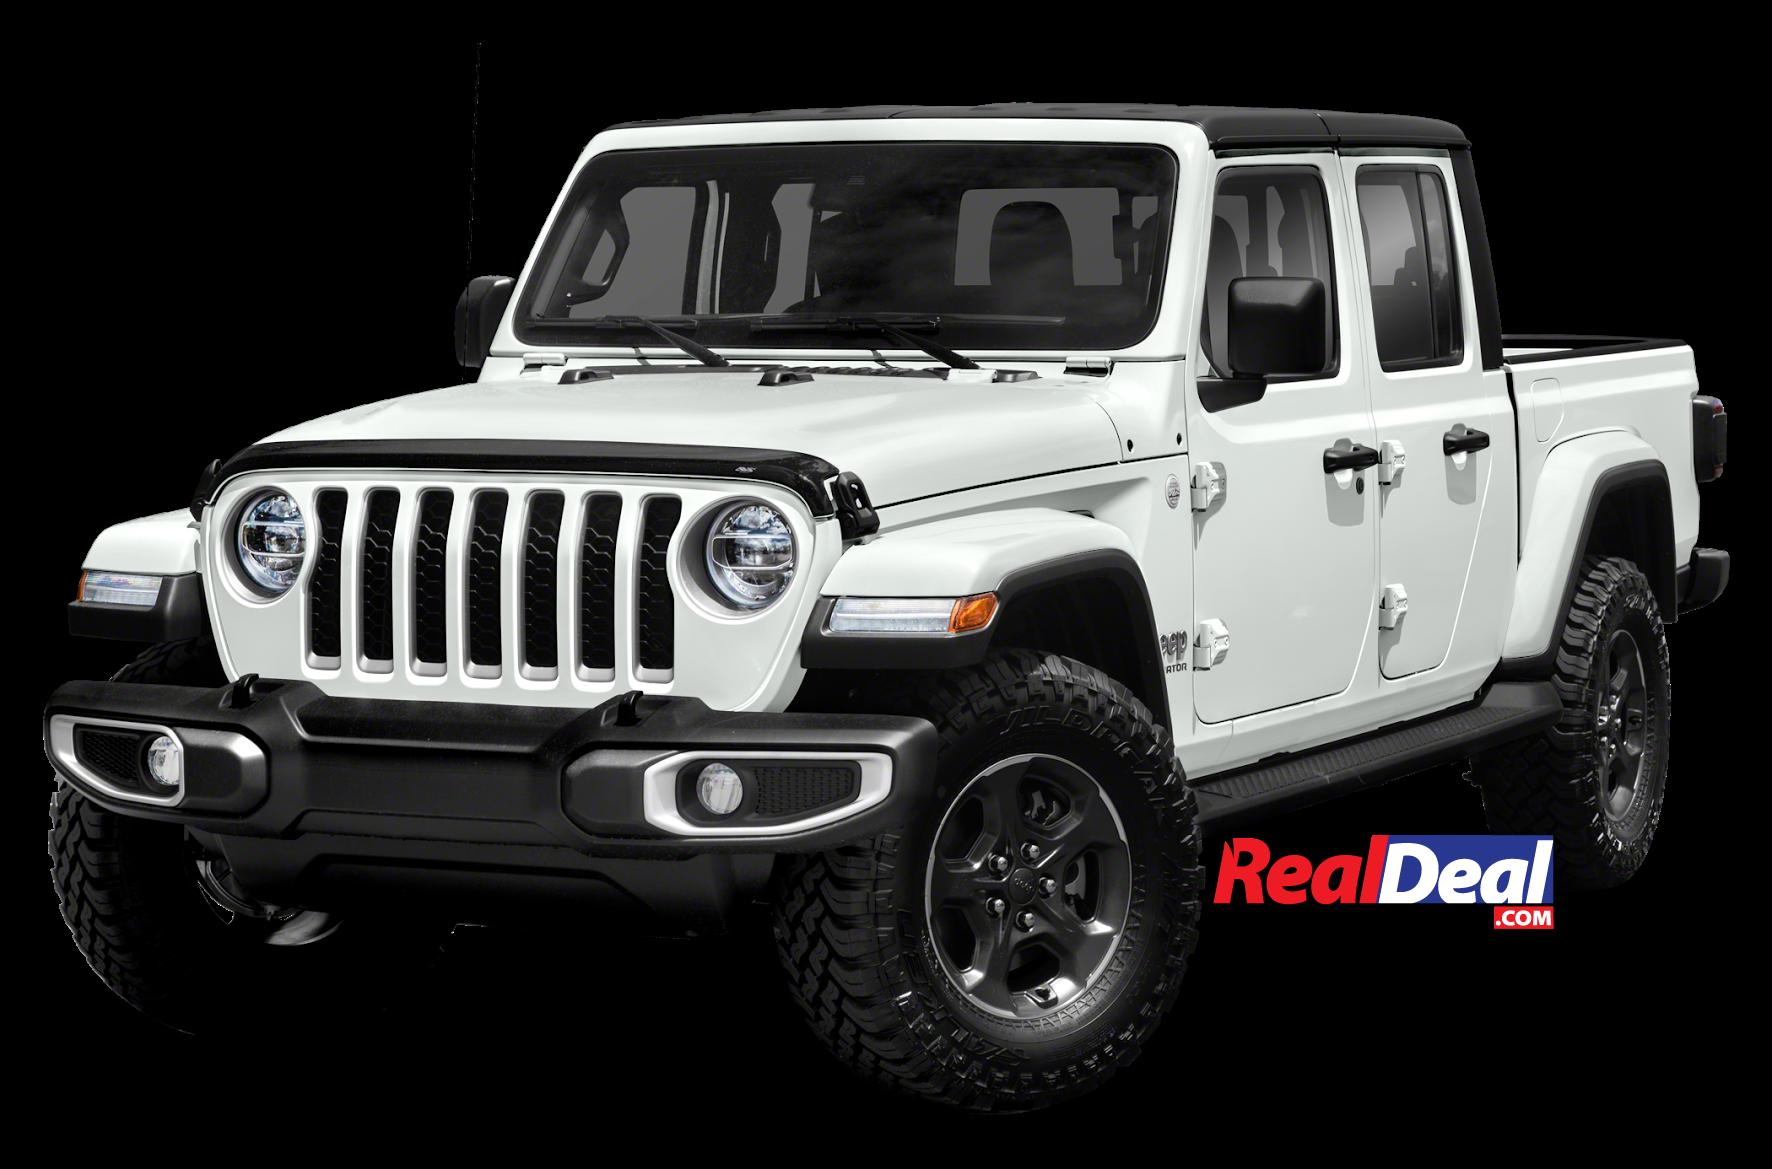 Jeep gladiAtor rd